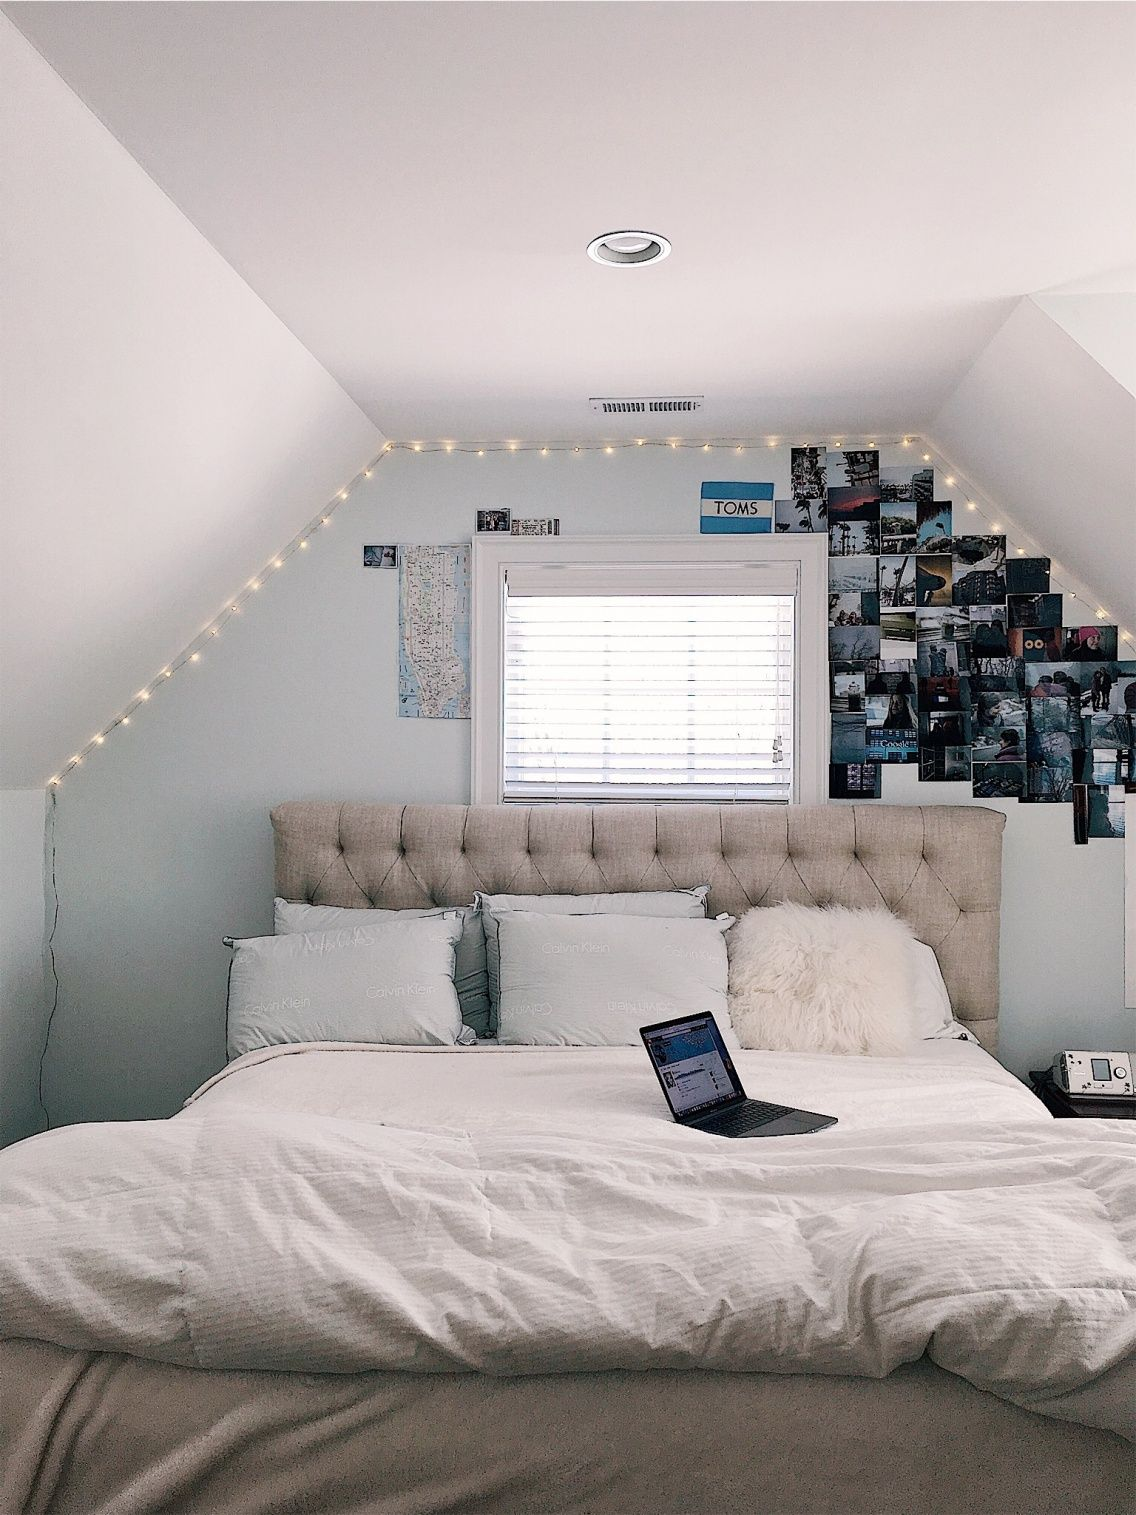 🖤 Aesthetic Bedroom Decor Pinterest - 2021